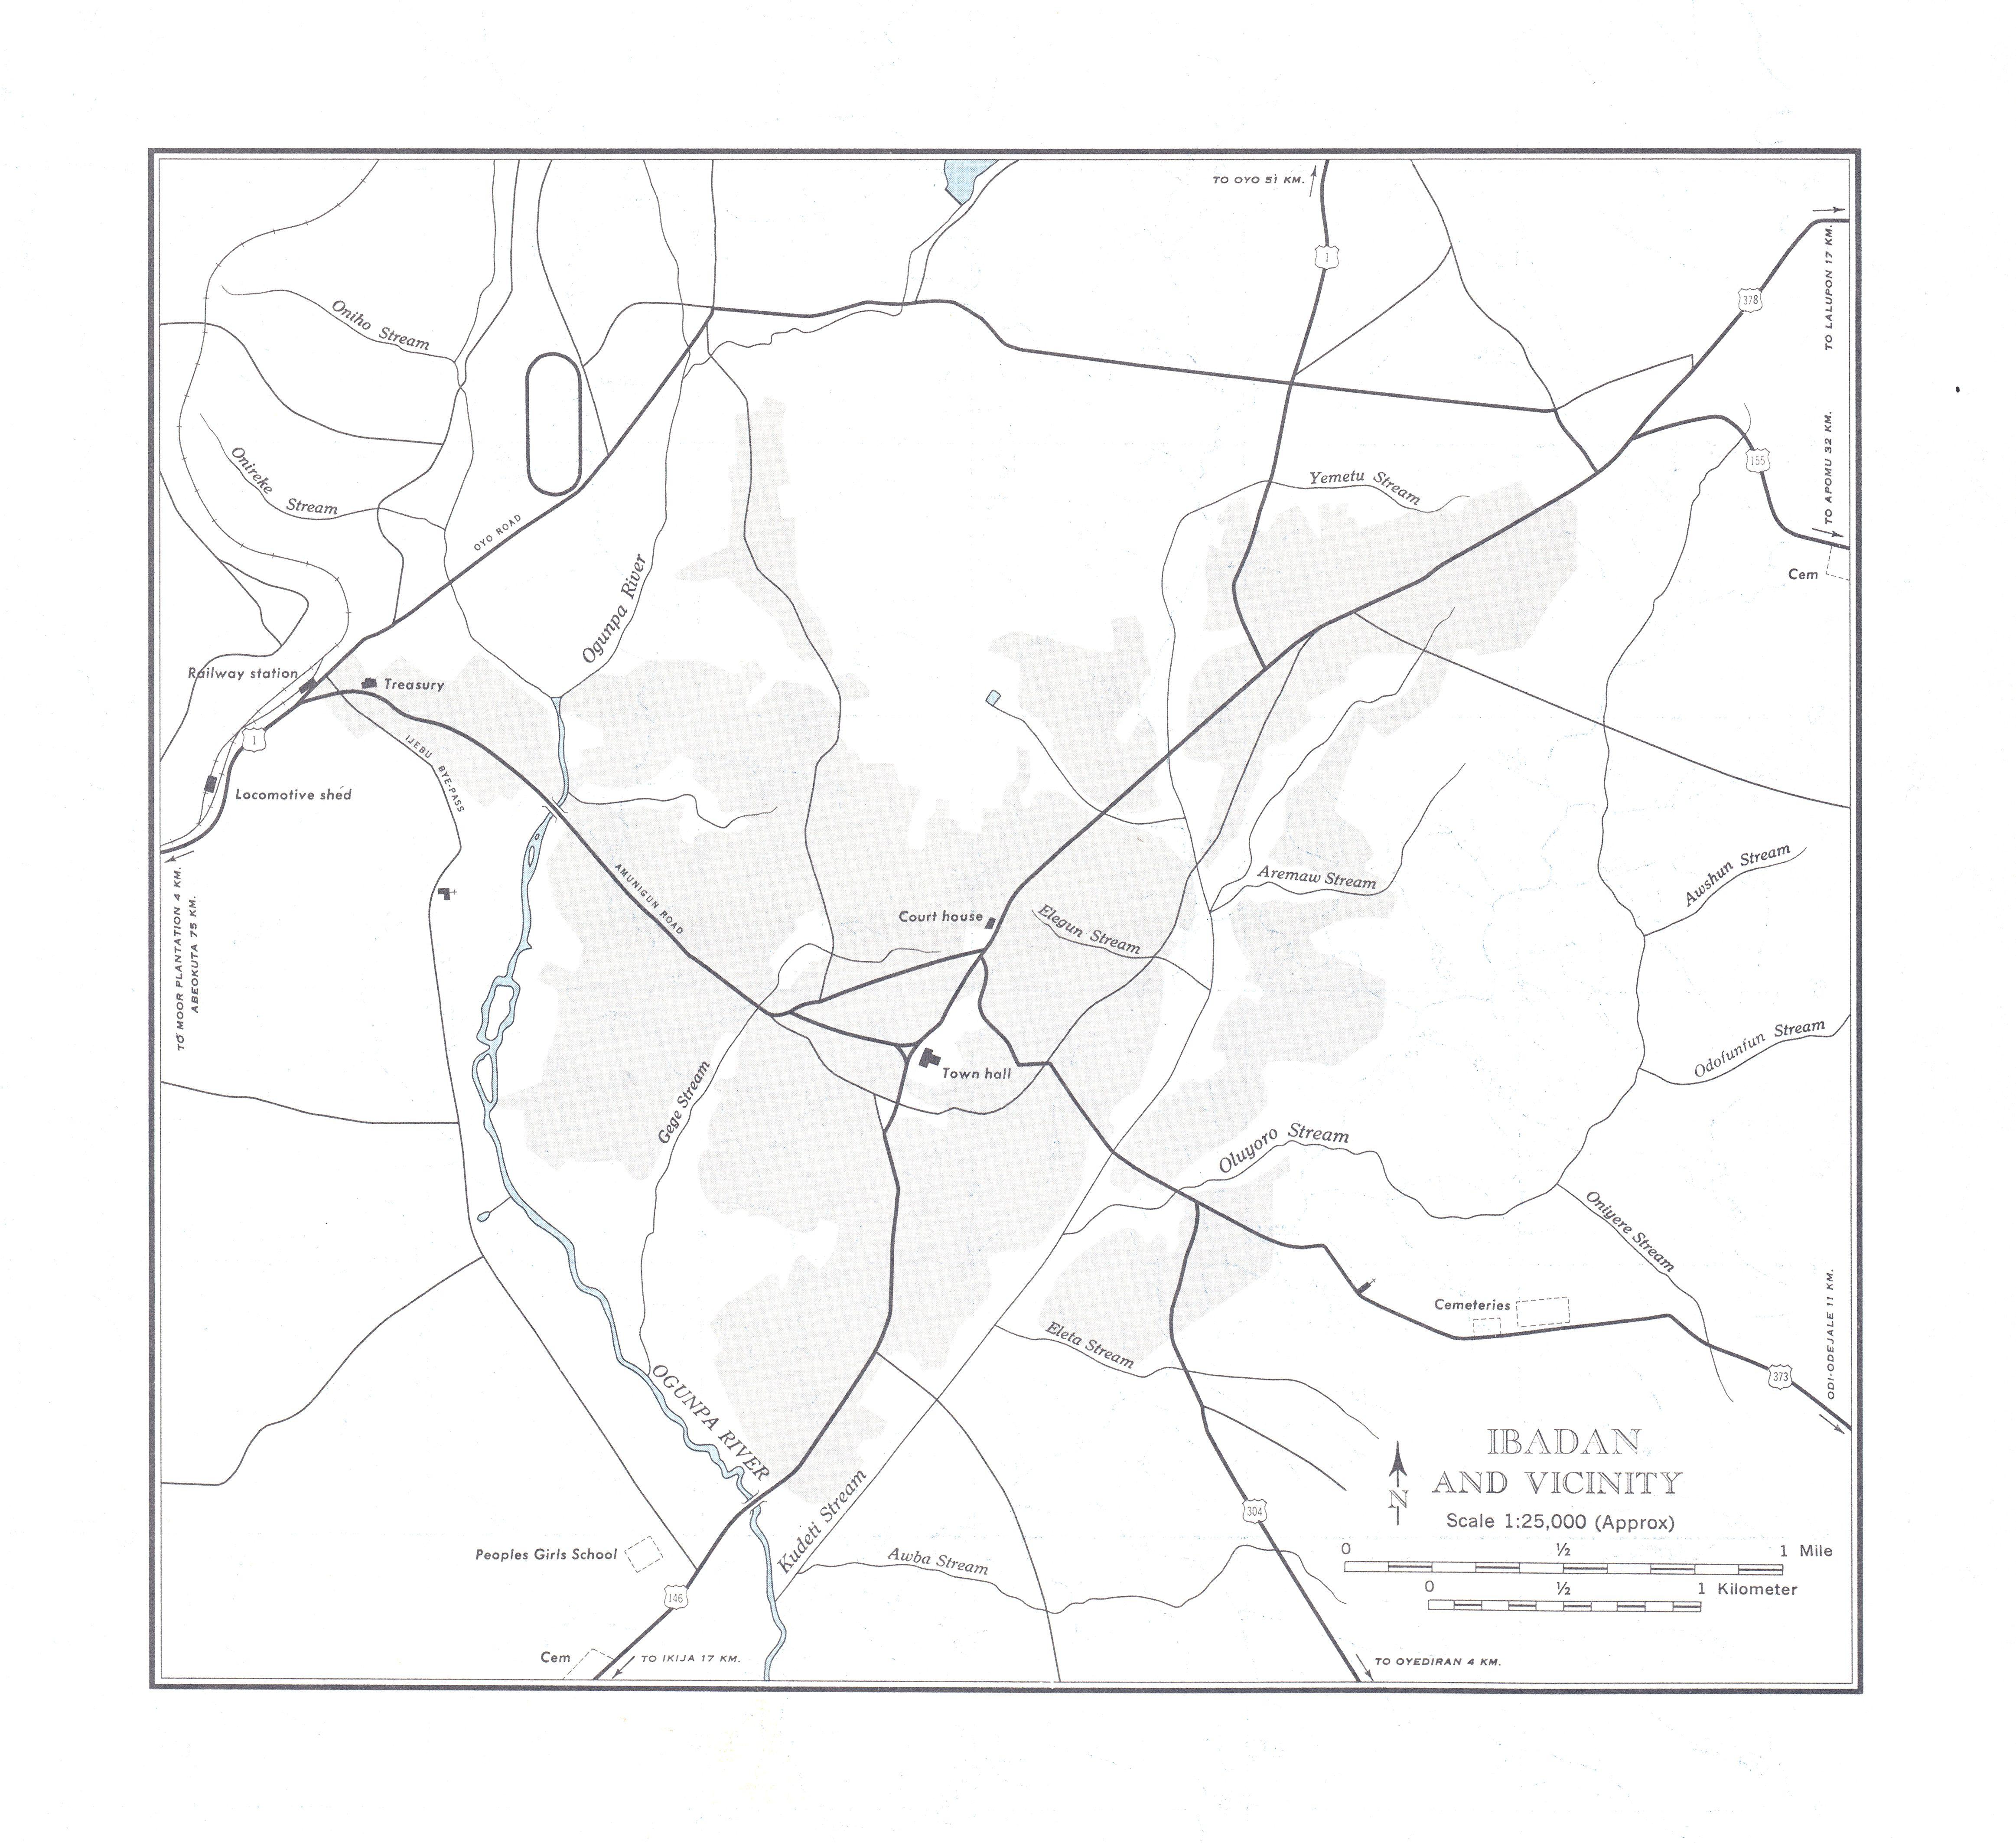 Ibadan and Vicinity City Map, Nigeria 1955